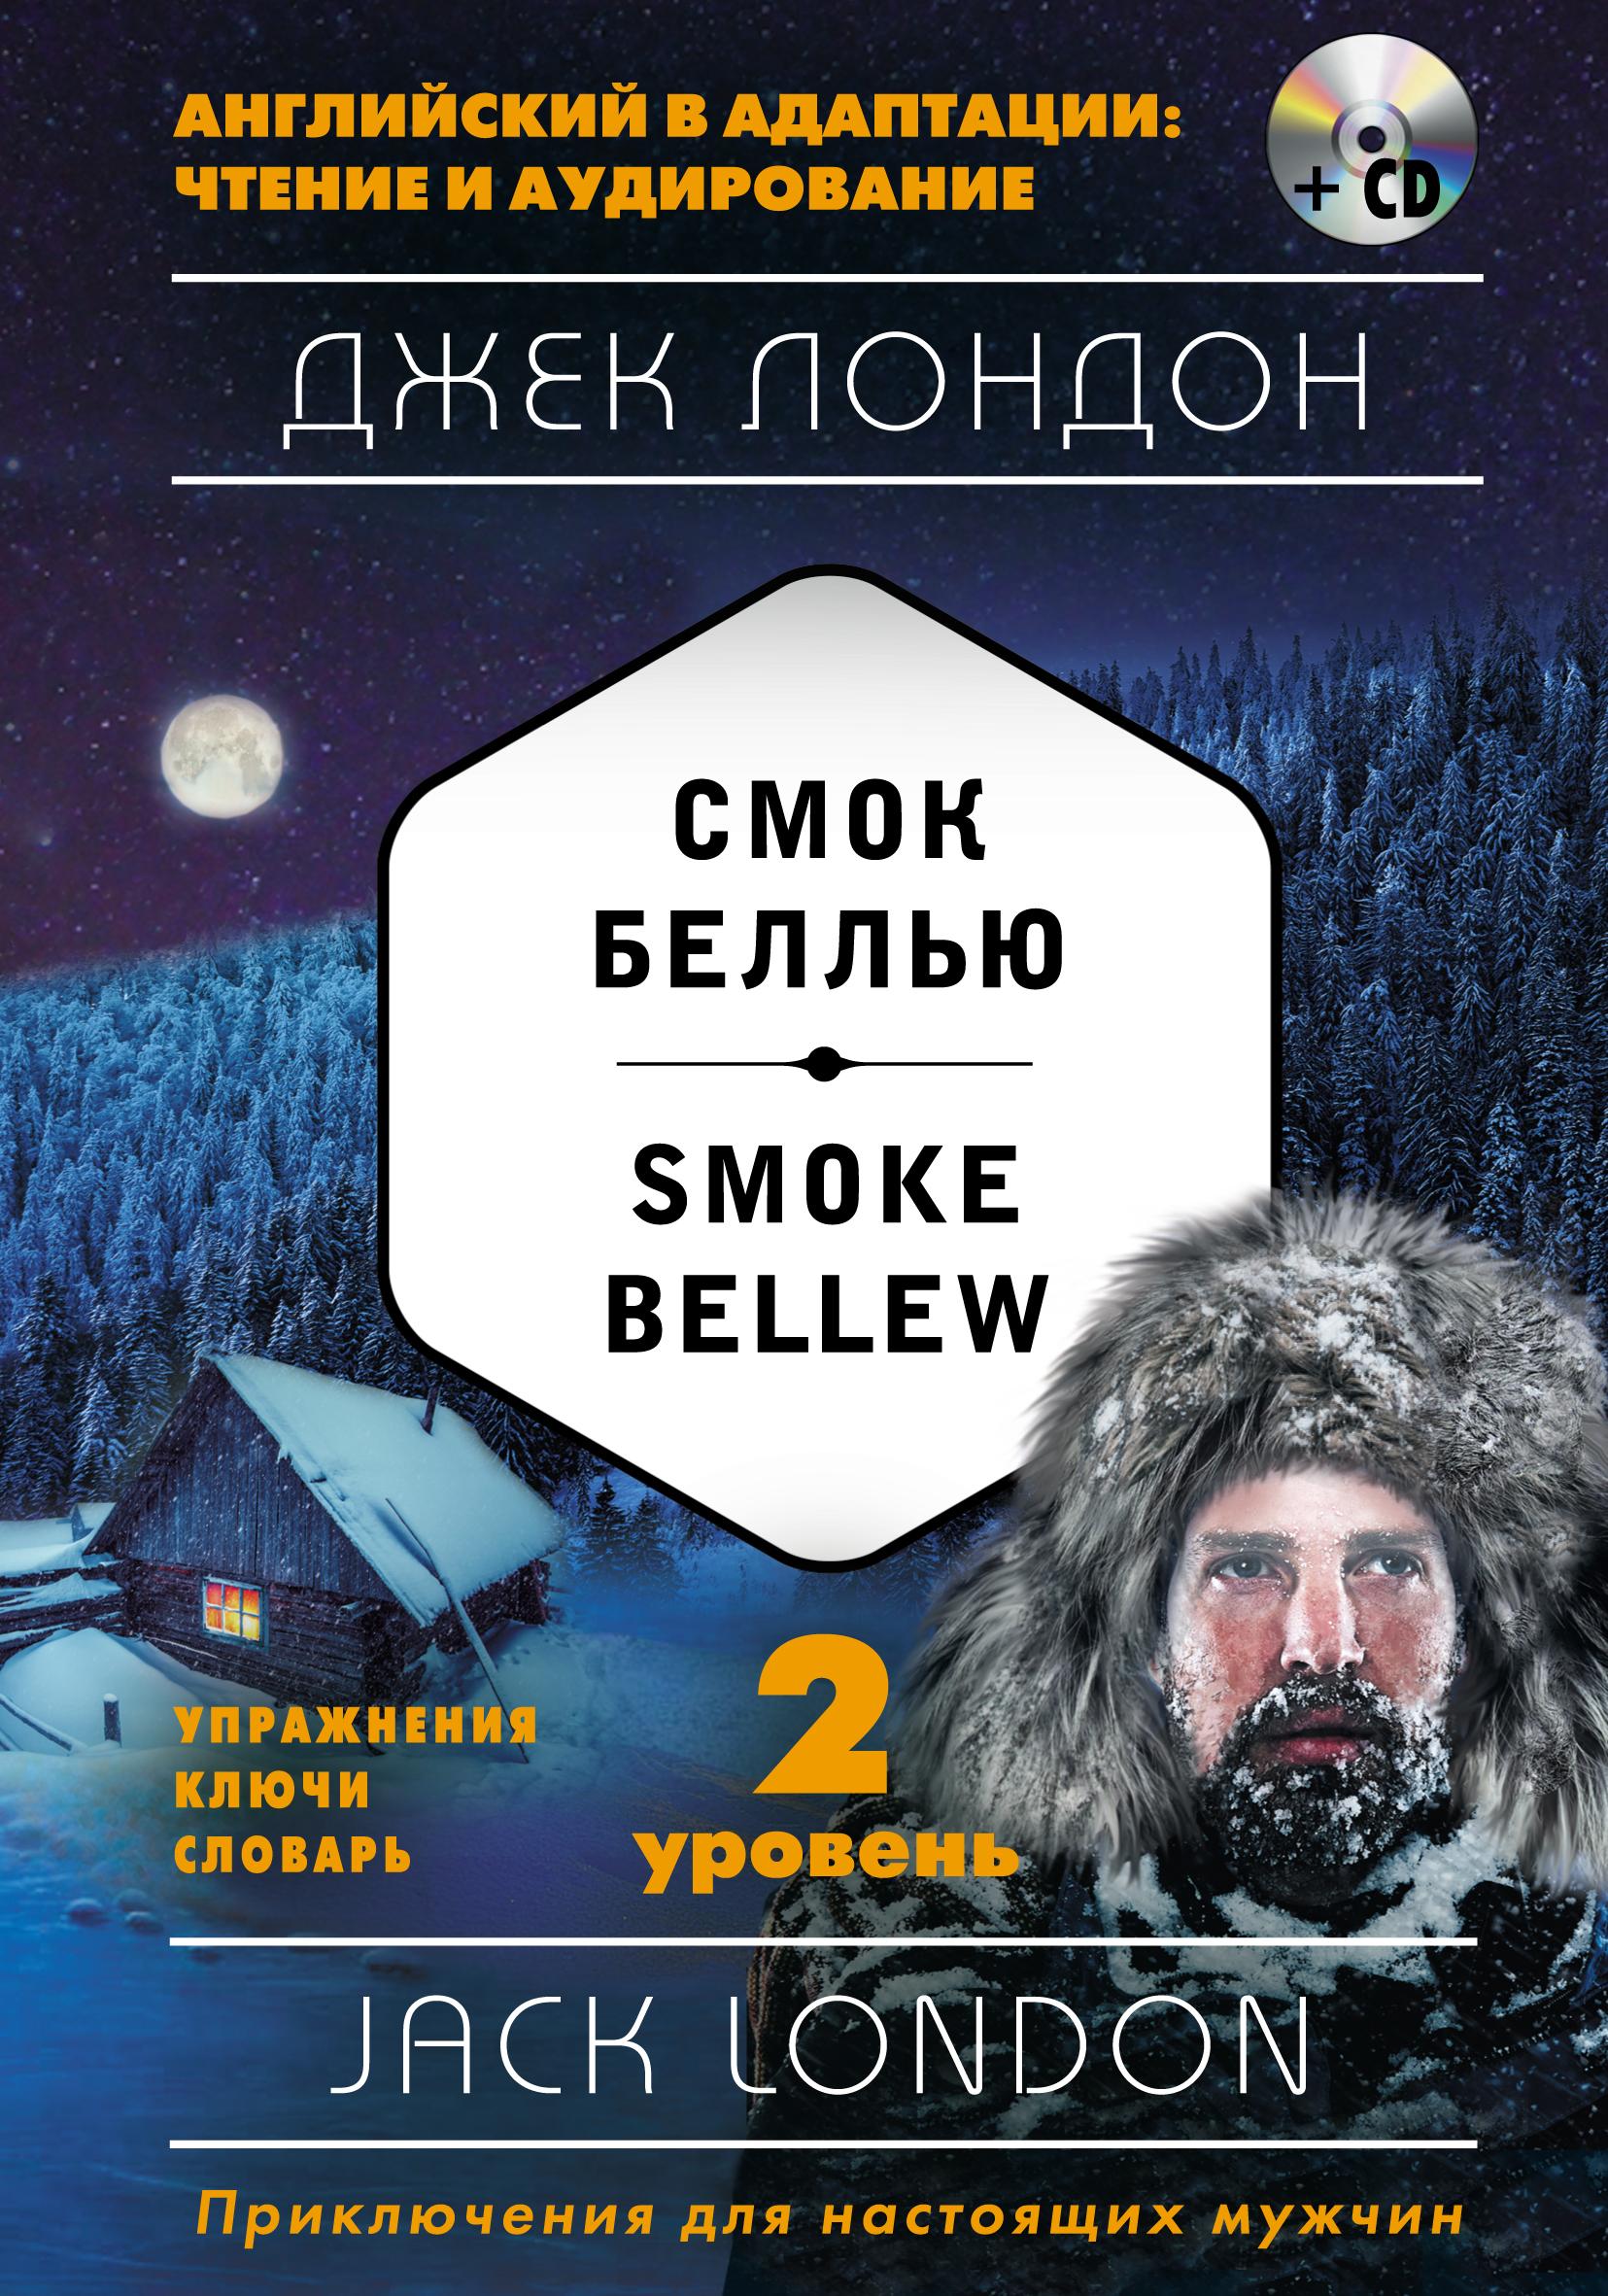 smok bellyu smoke bellew 2 uroven mp3